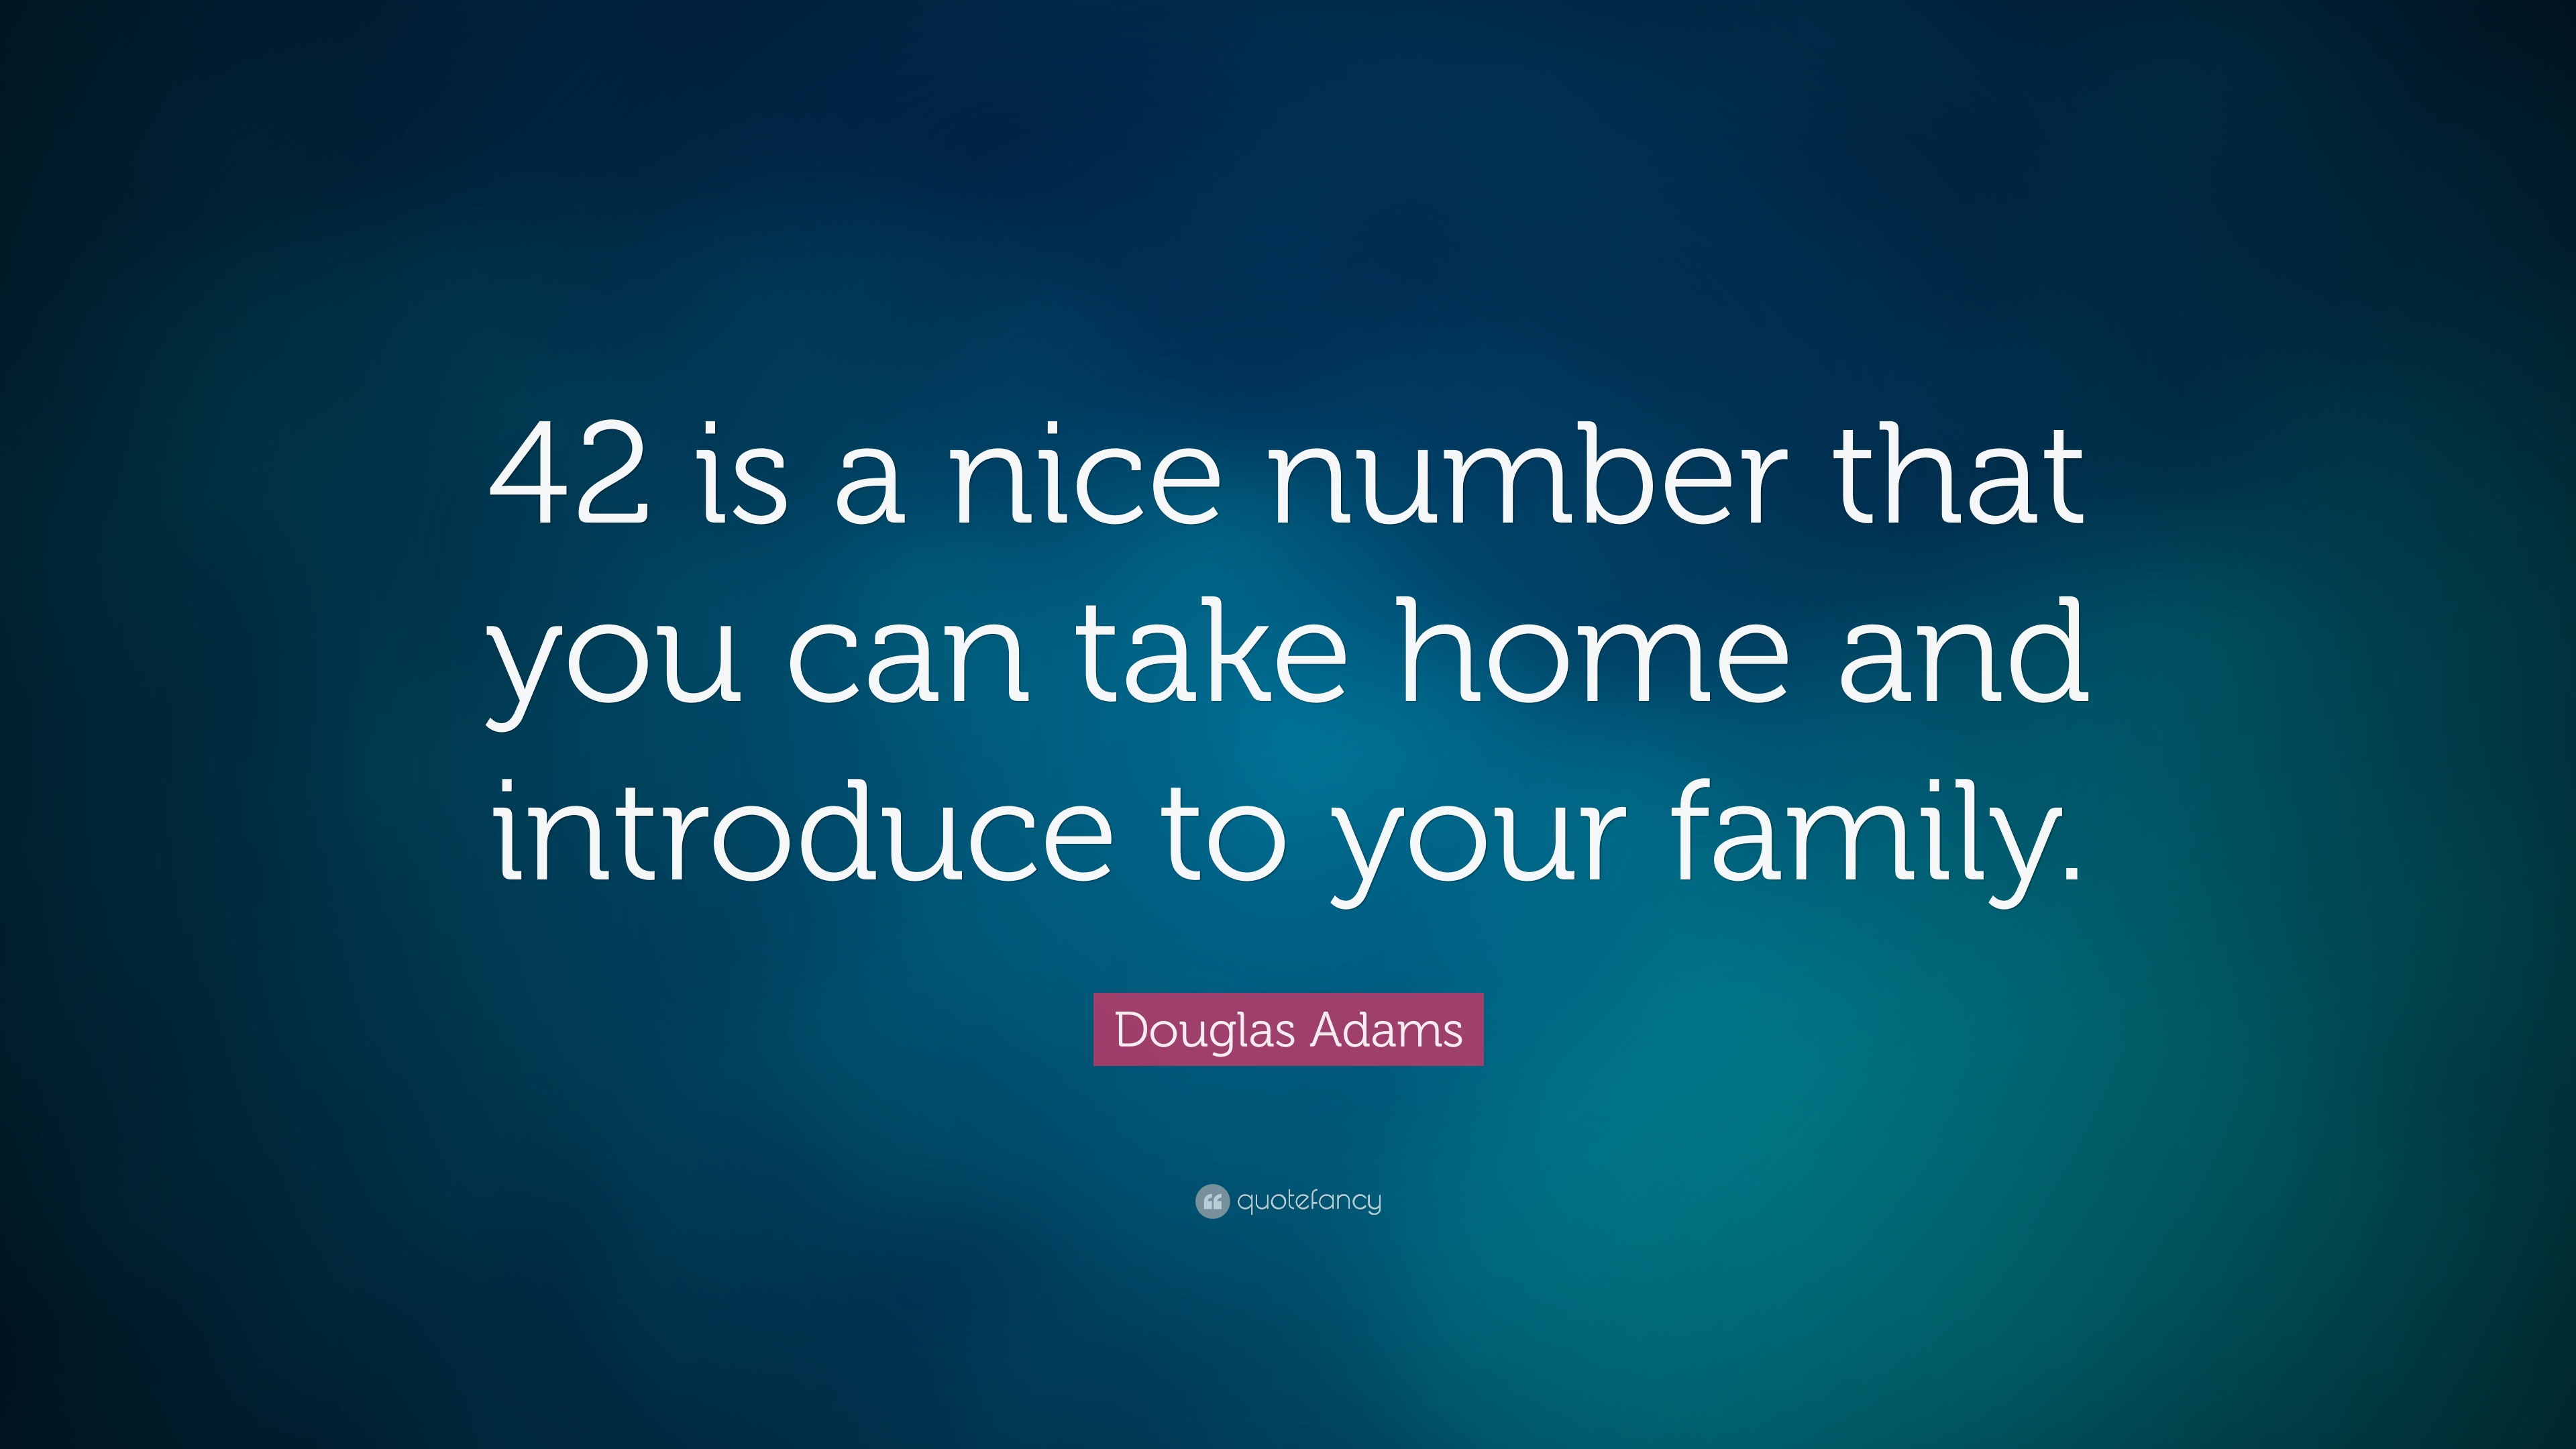 Douglas Adams 42 Quote